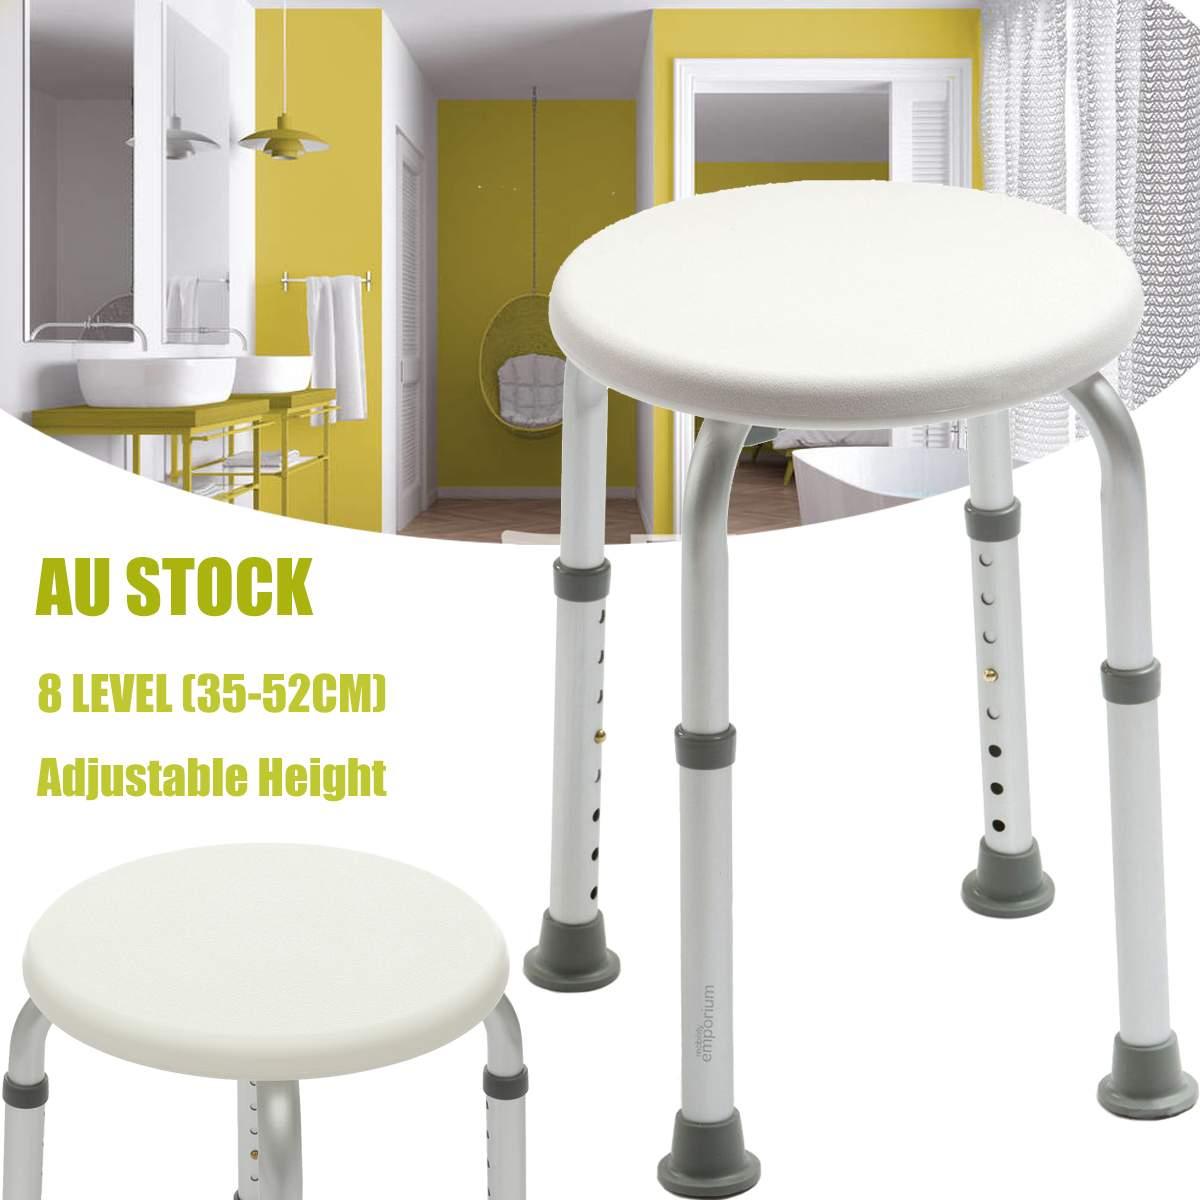 Us 25 6 51 Off Adjustable Shower Chair Bath Seat Adjustable Medical Safety Aluminum Stool Seating Toilet Shower Chairs Kids Bed Shower Chair In